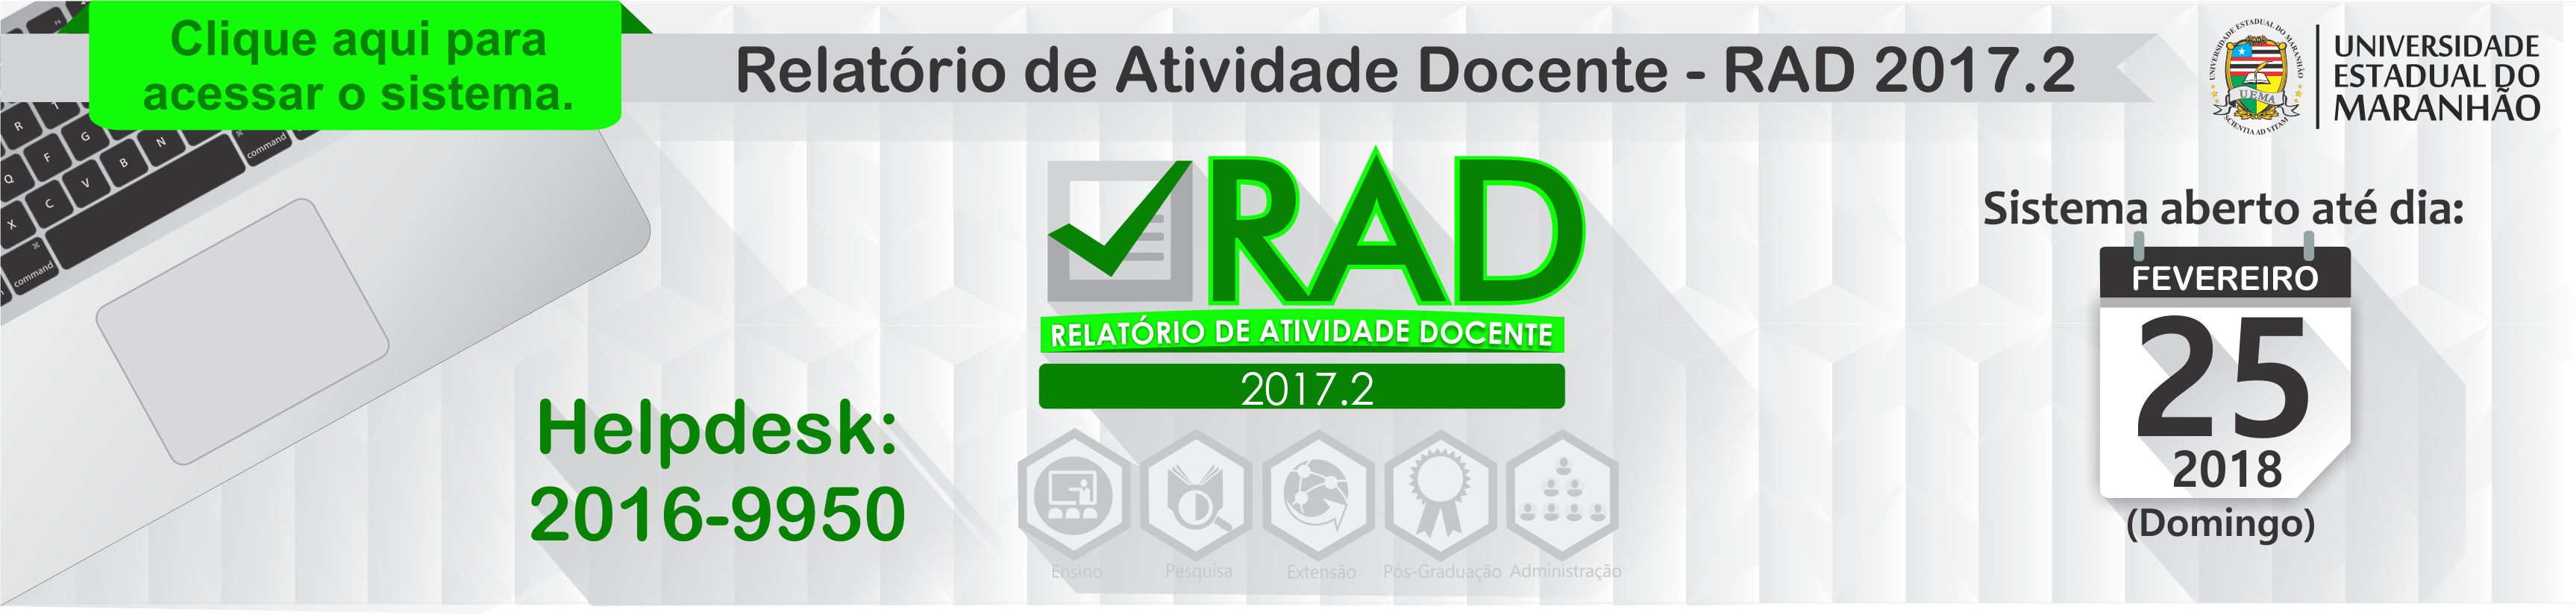 RAD_2018_2017_21